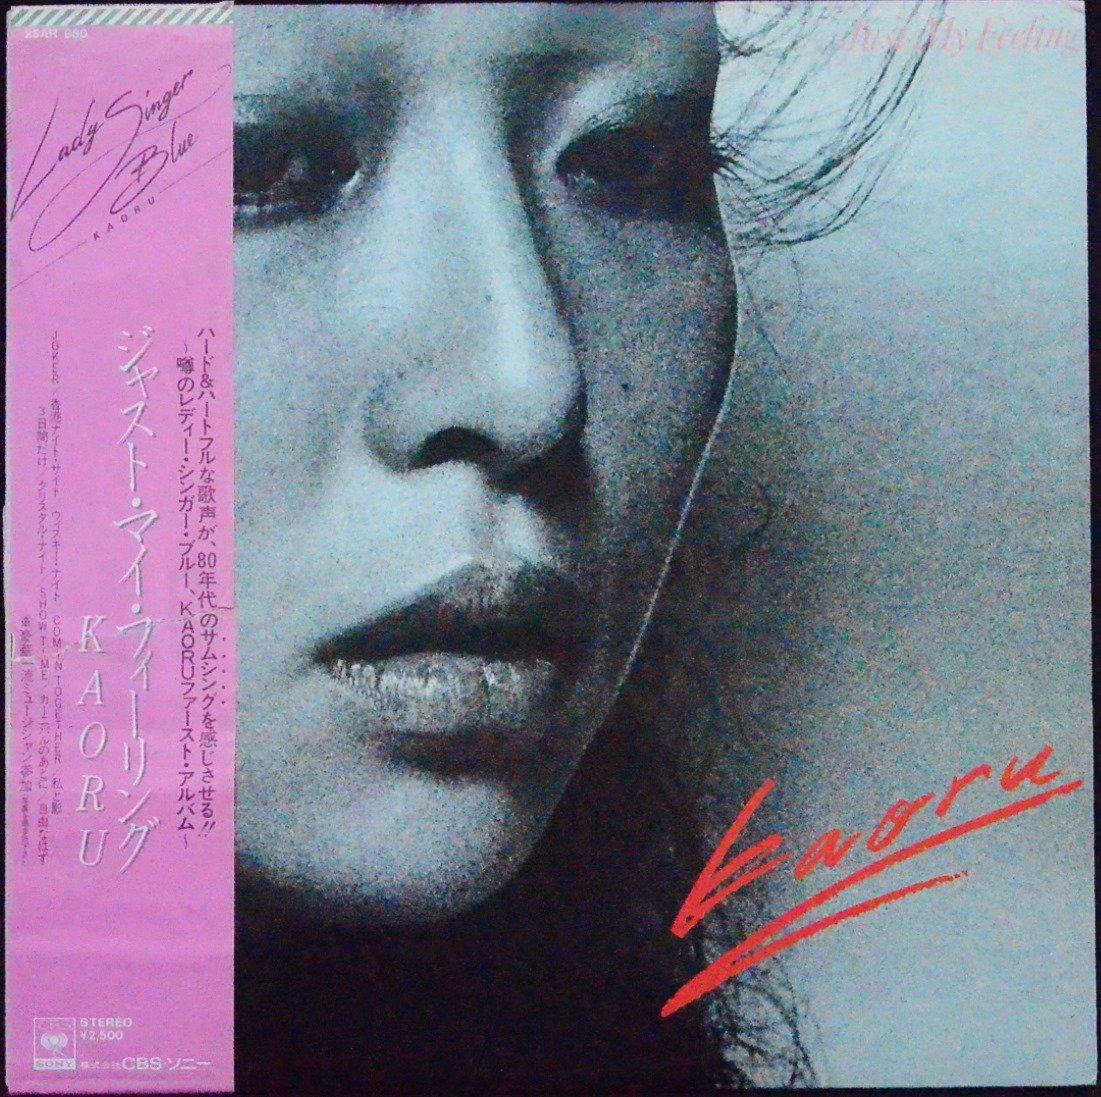 KAORU / ジャスト・マイ・フィーリング JUST MY FEELING (LP)